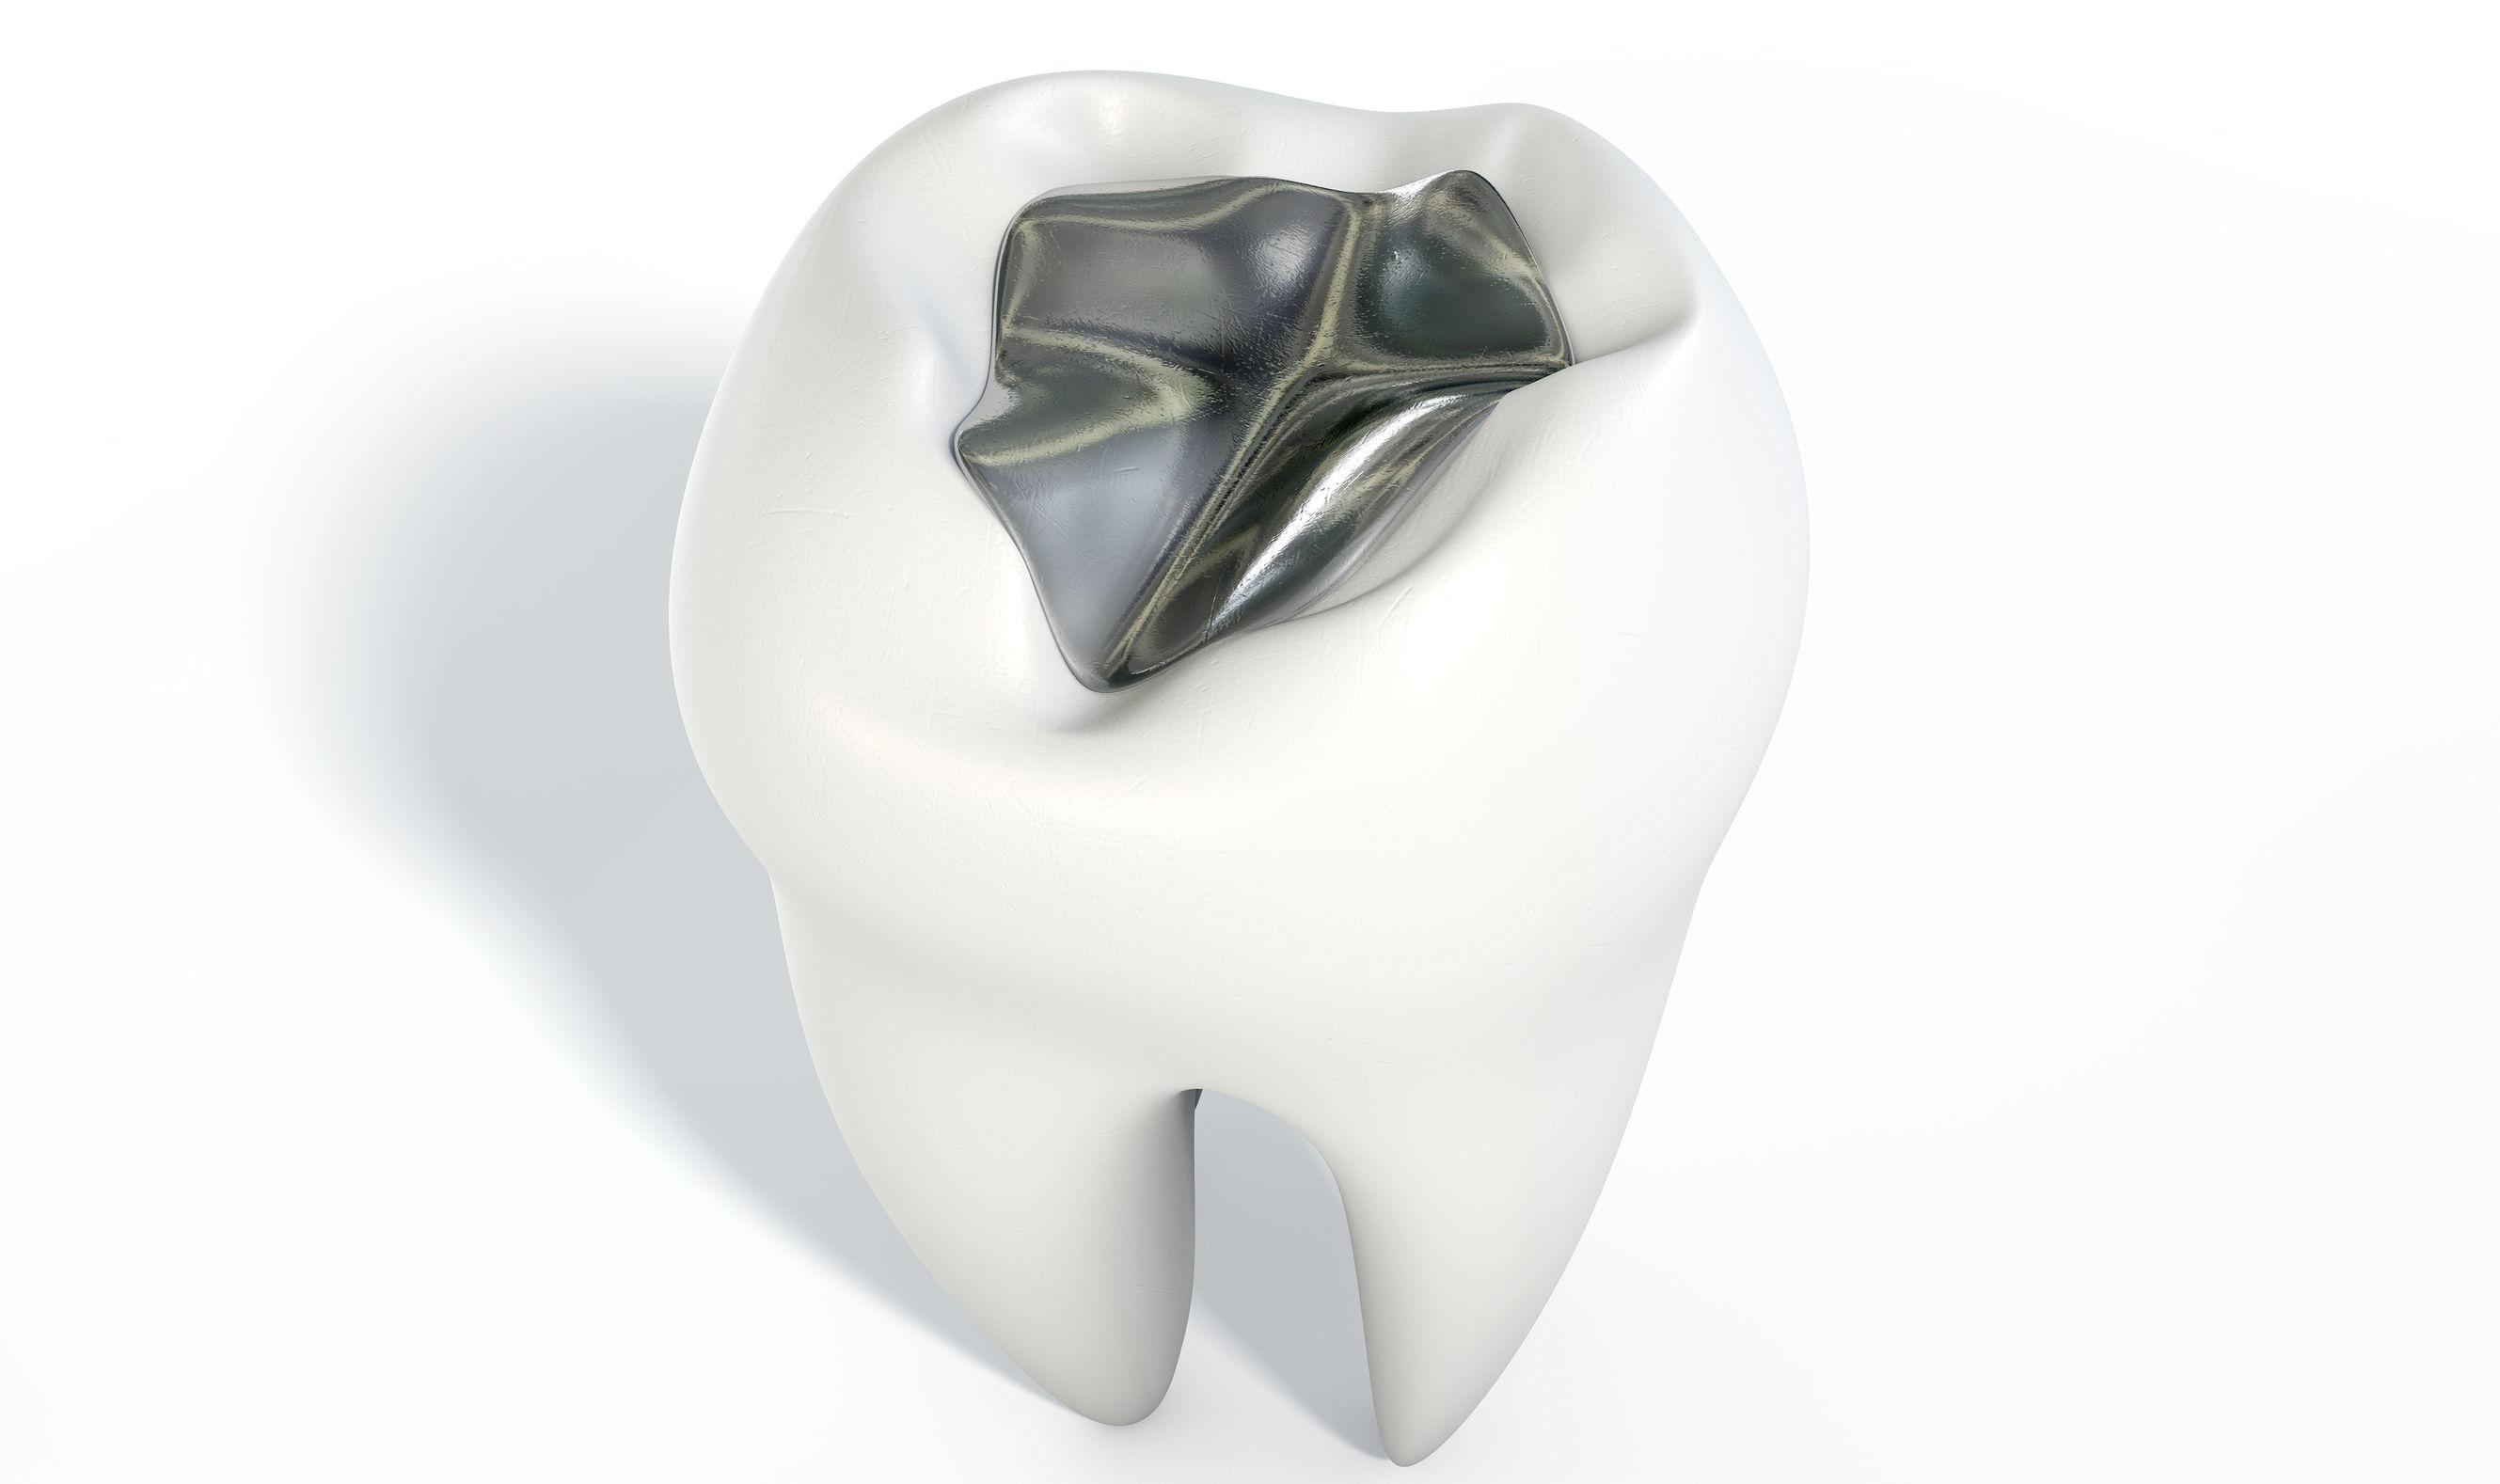 Franklin Square dentist